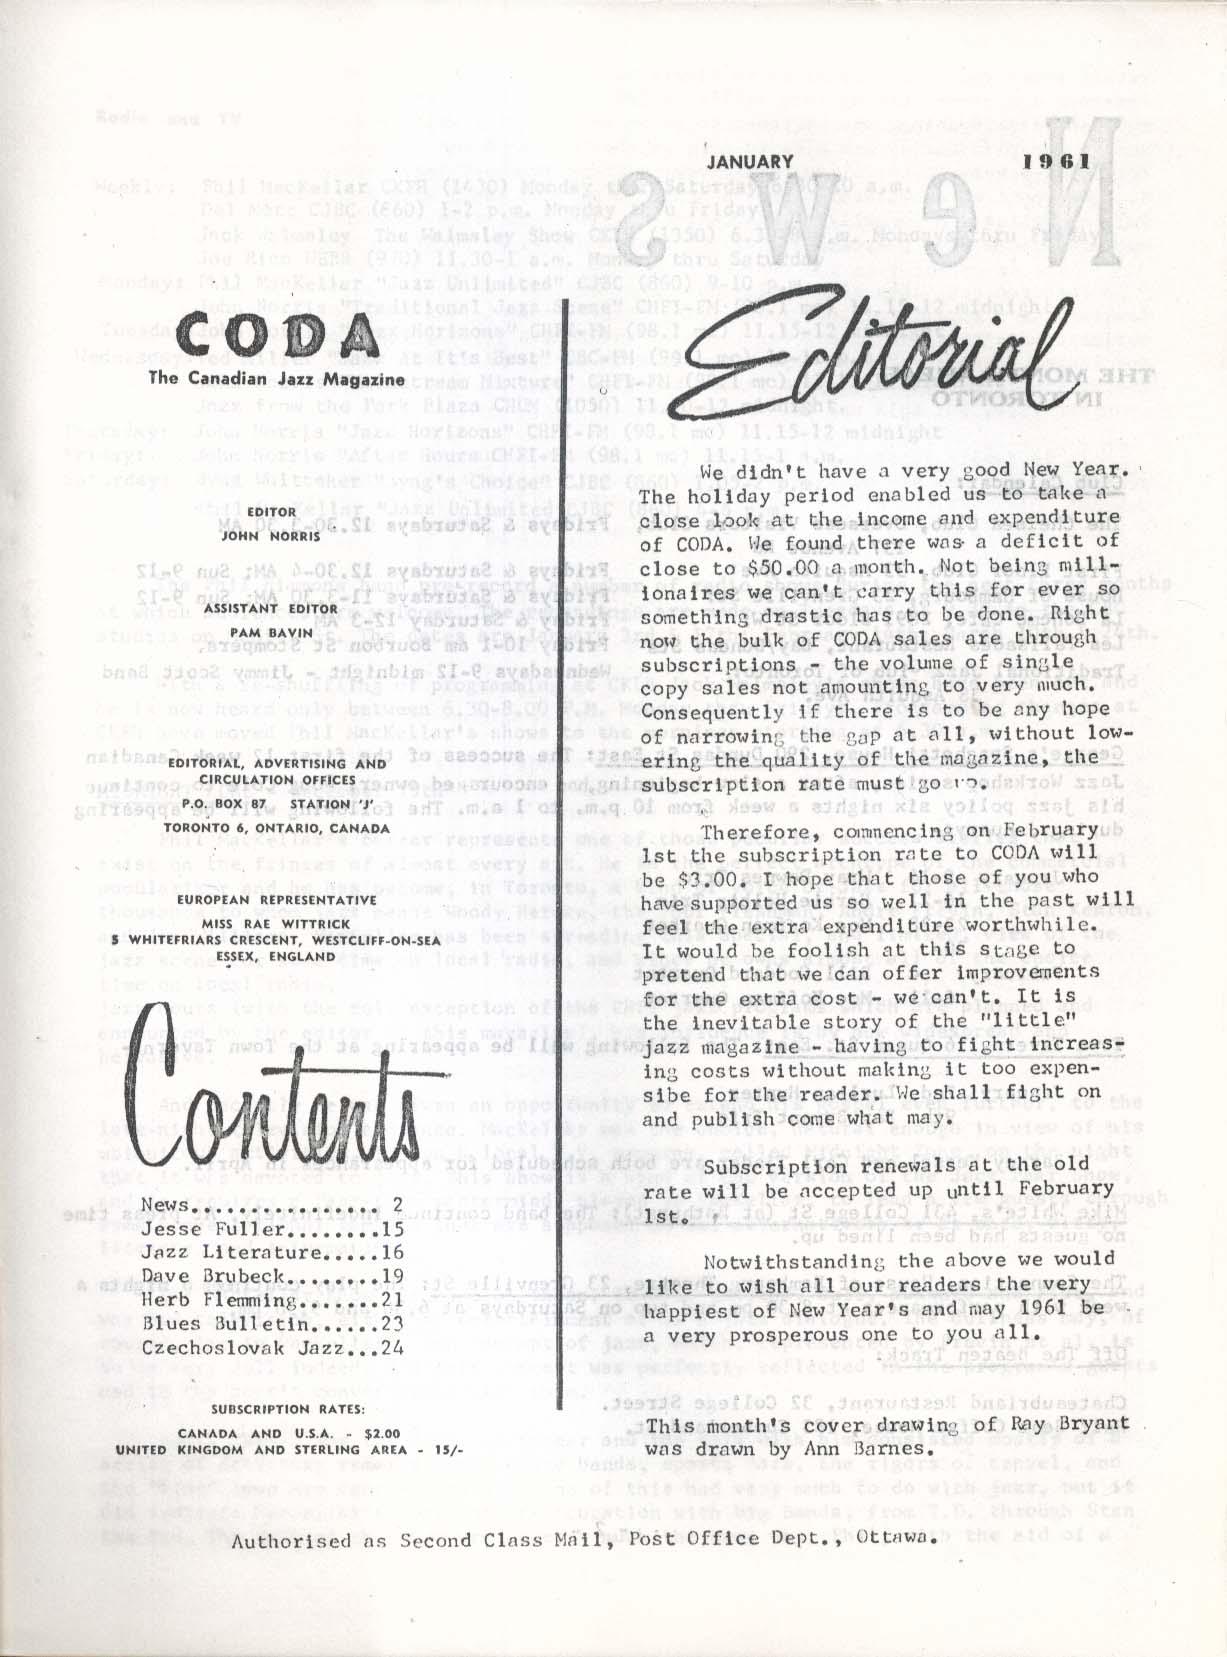 CODA V3 #9 Canadian Jazz Magazine Jesse Fuller Dave Brubeck Herb Flemming 1 1961